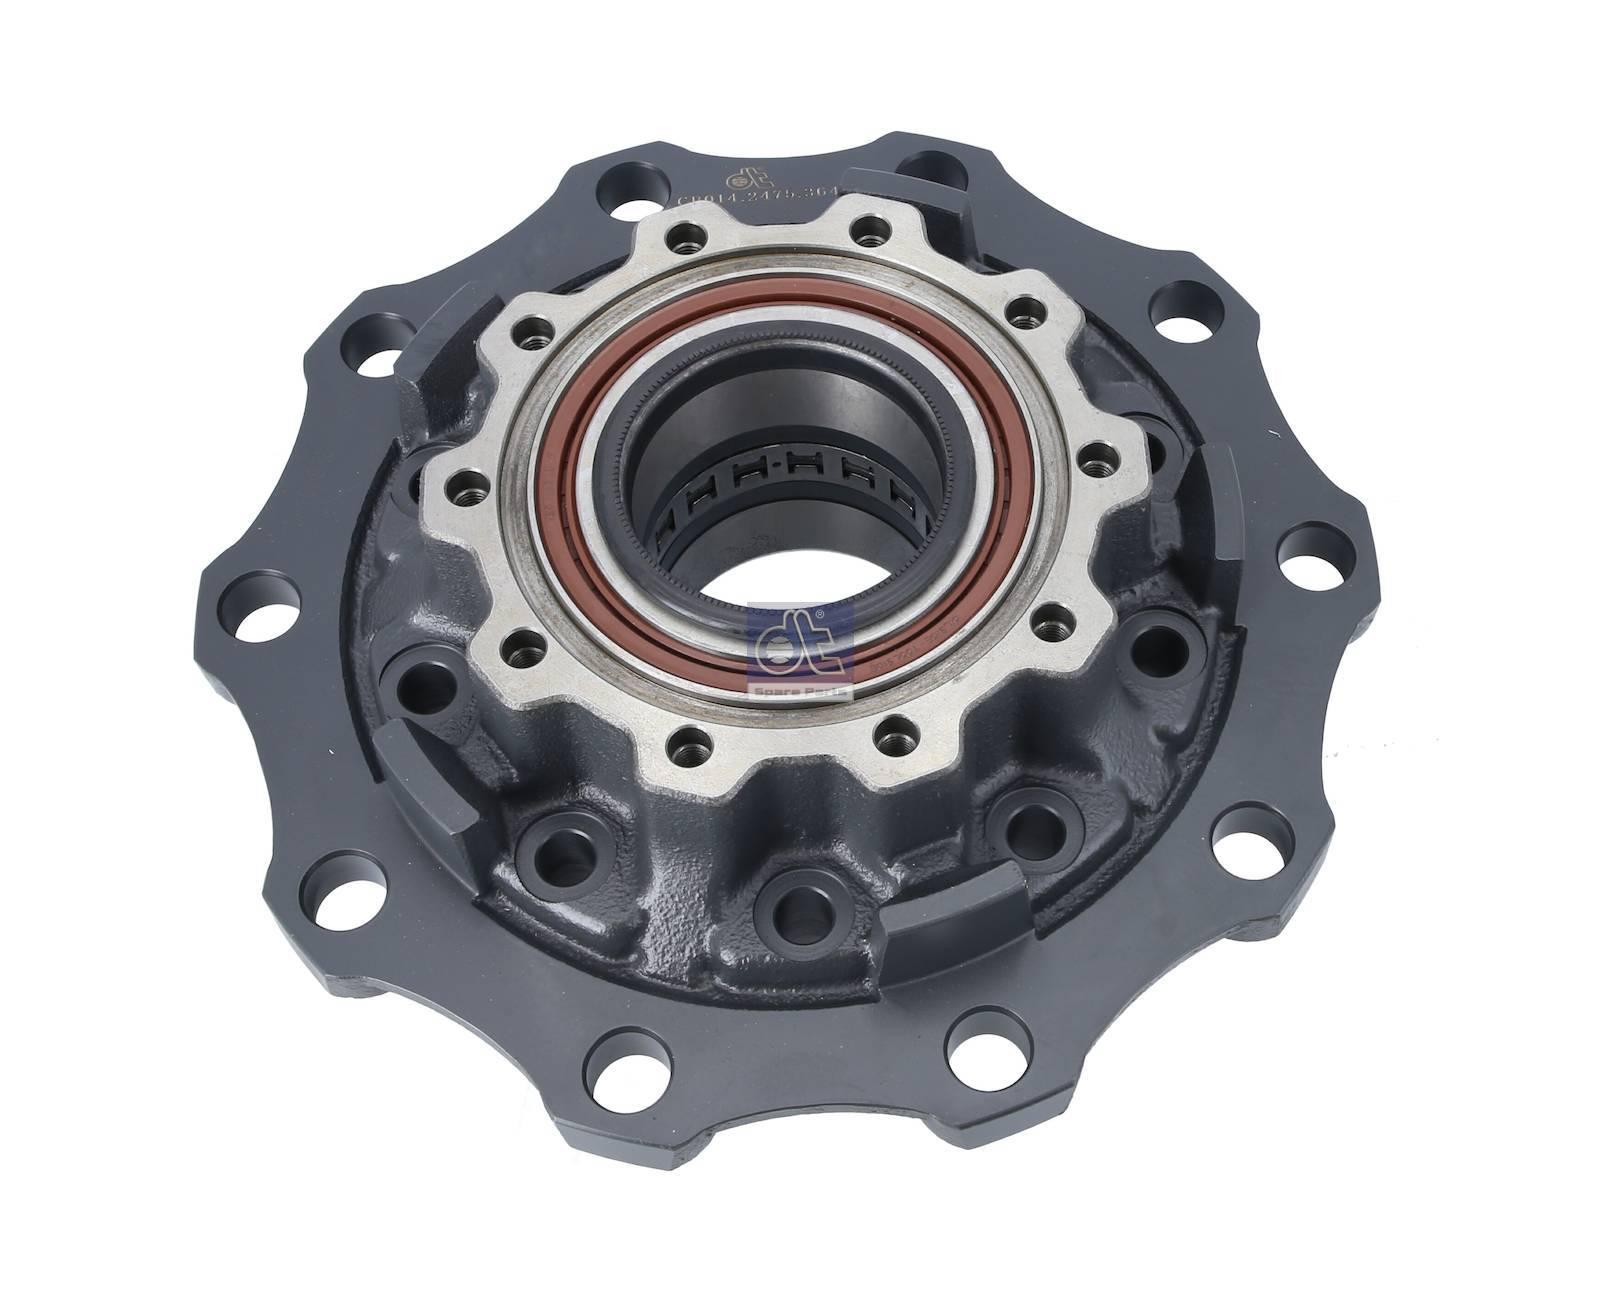 Wheel hub, with bearing